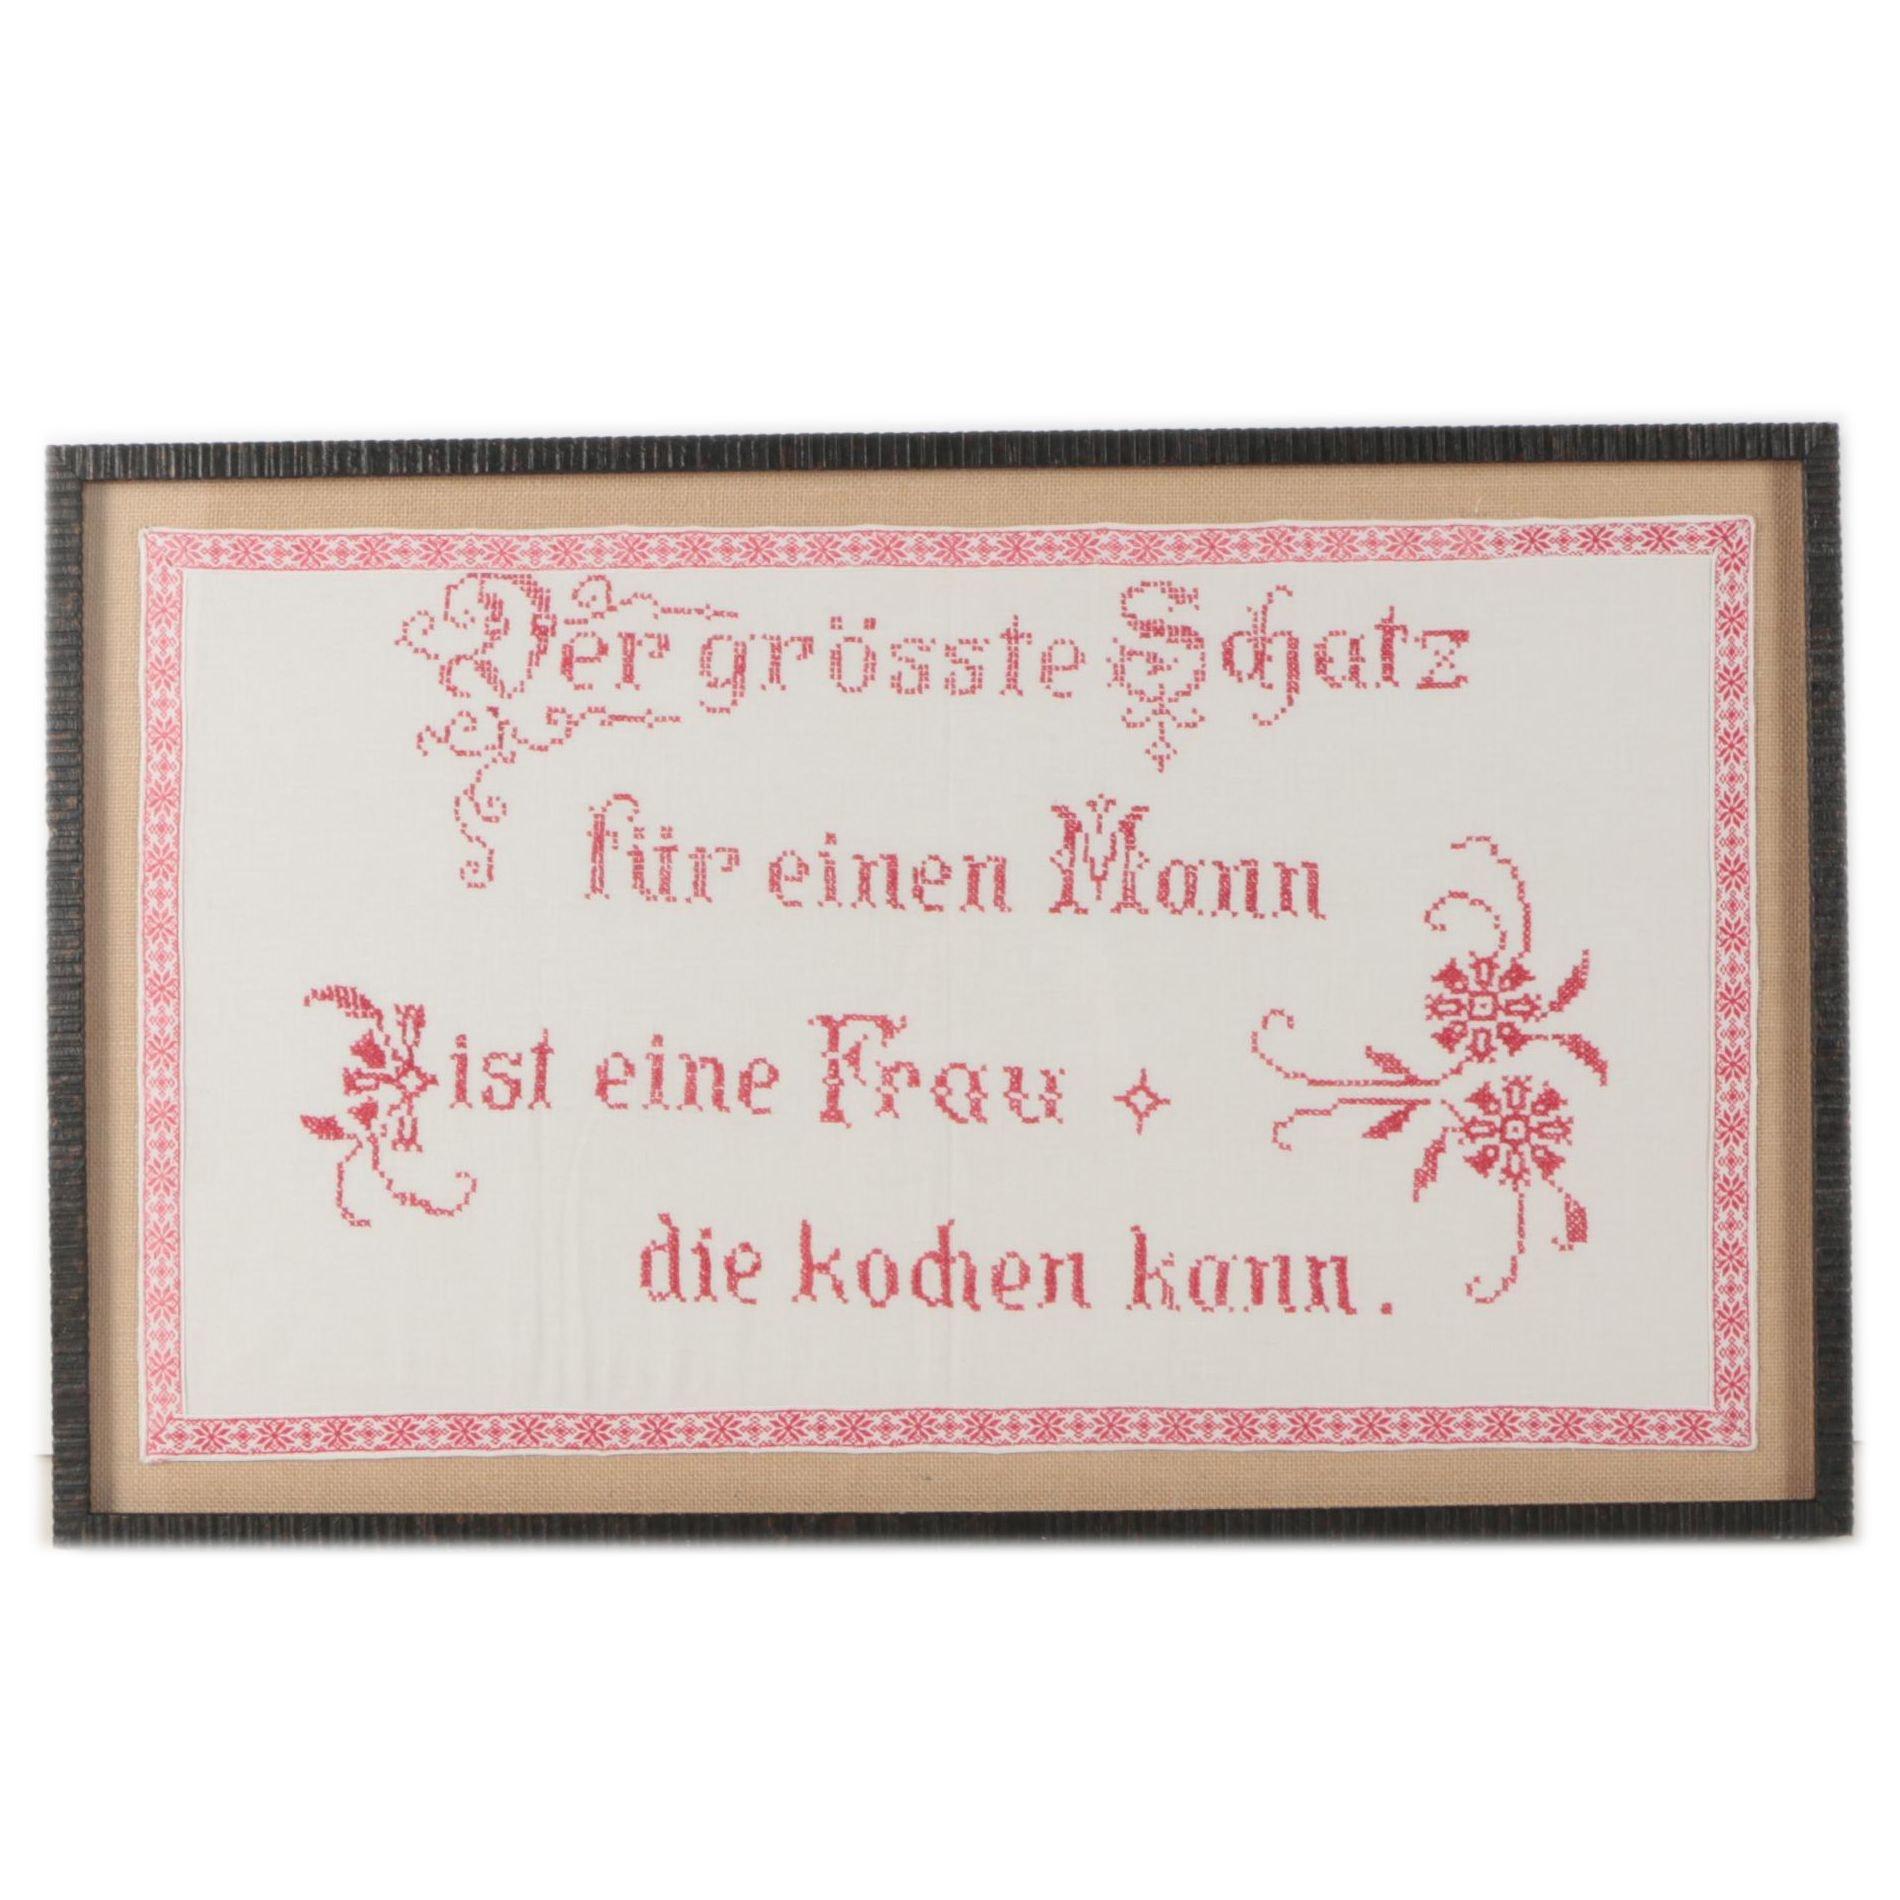 Cross Stitch Sampler of German Phrase